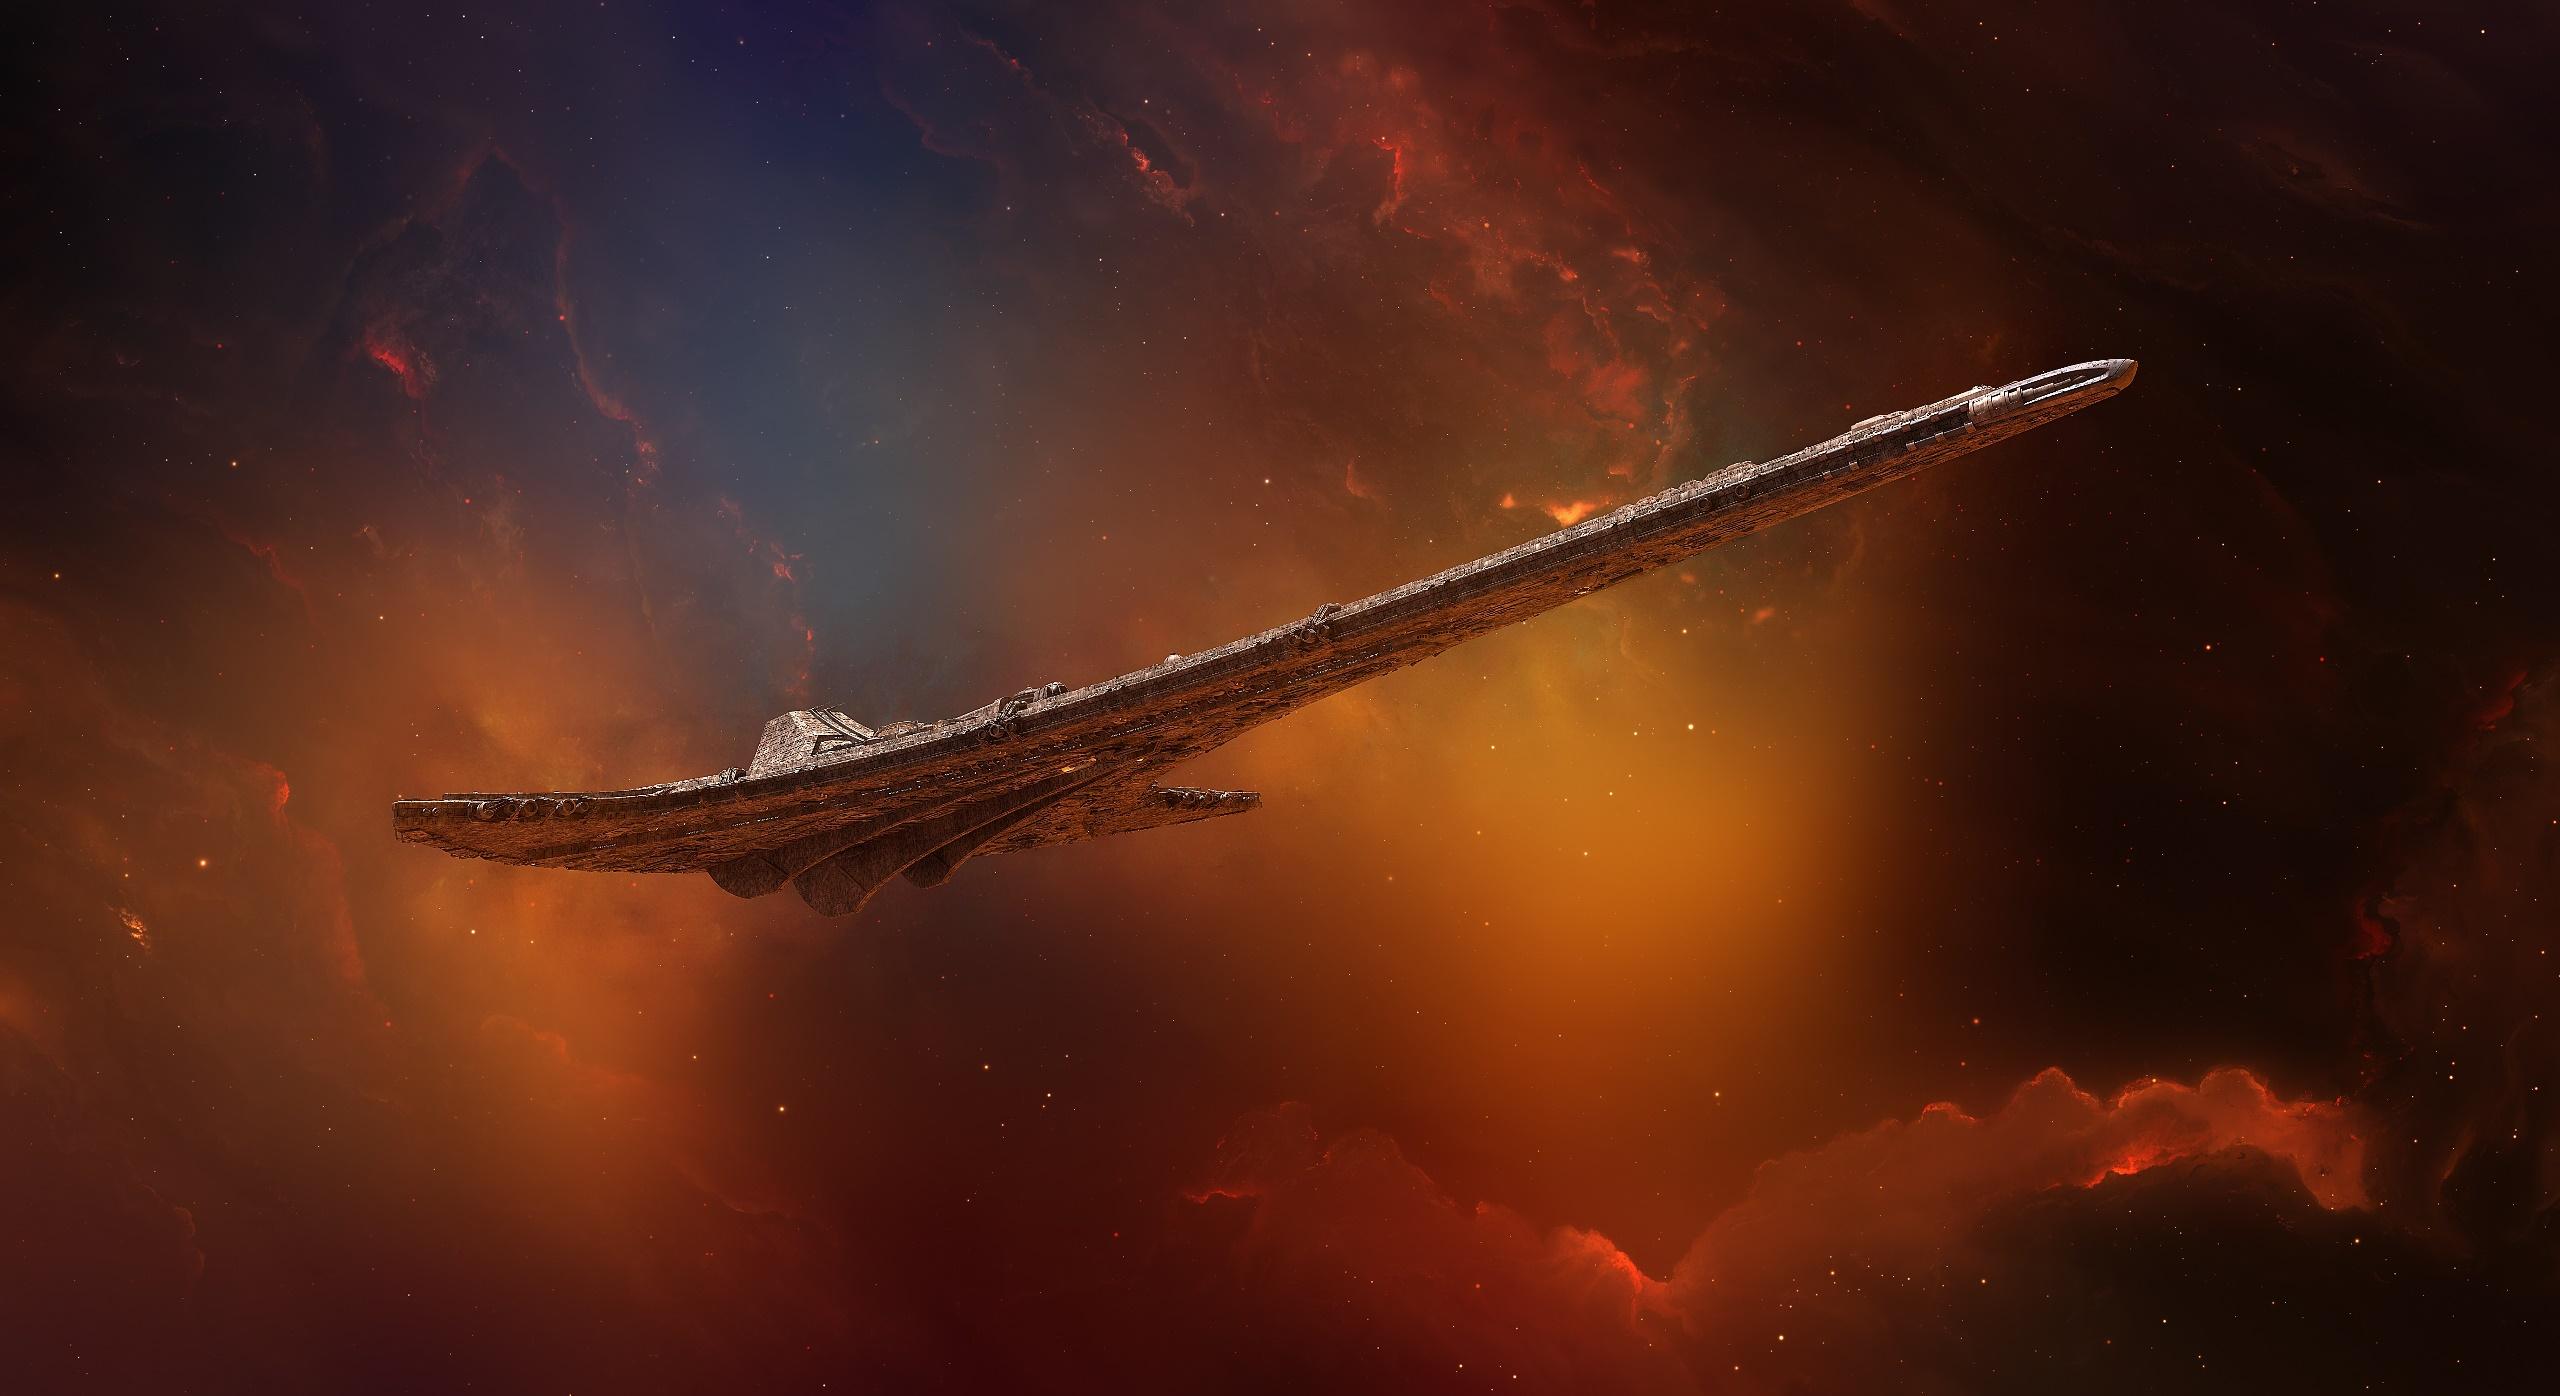 General 2560x1396 space space art science fiction artwork Stargate Universe Destiny (spaceship)